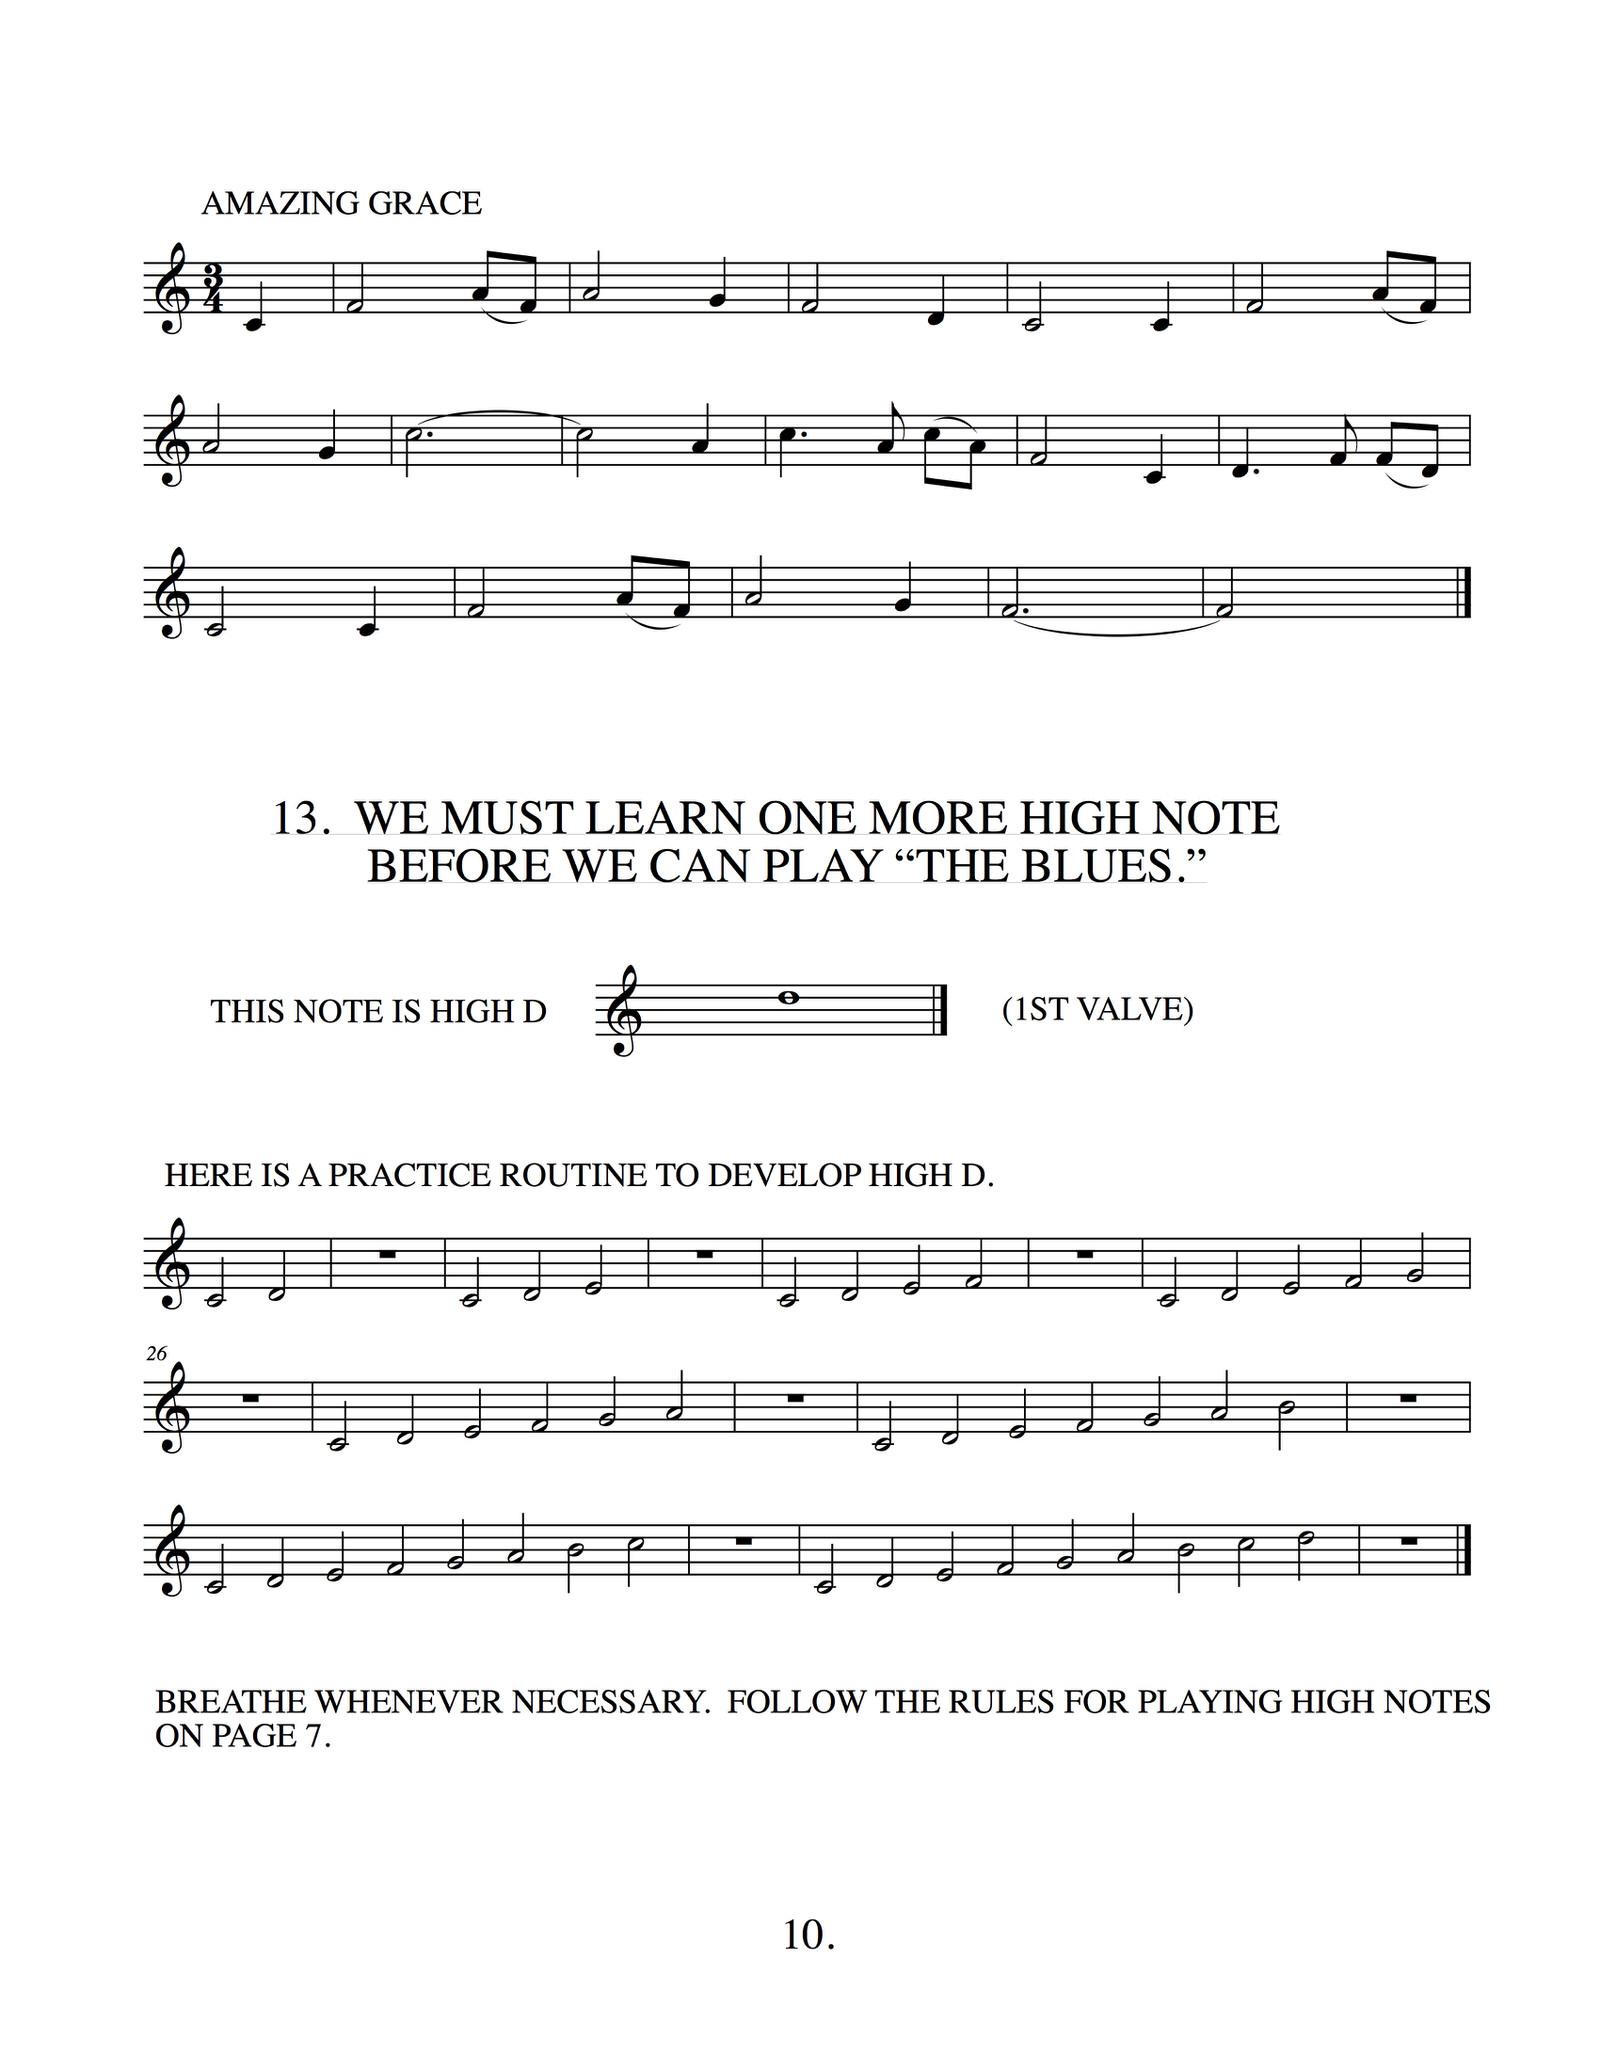 Getting Started Right on Trumpet by Knevitt, Bill | qPress